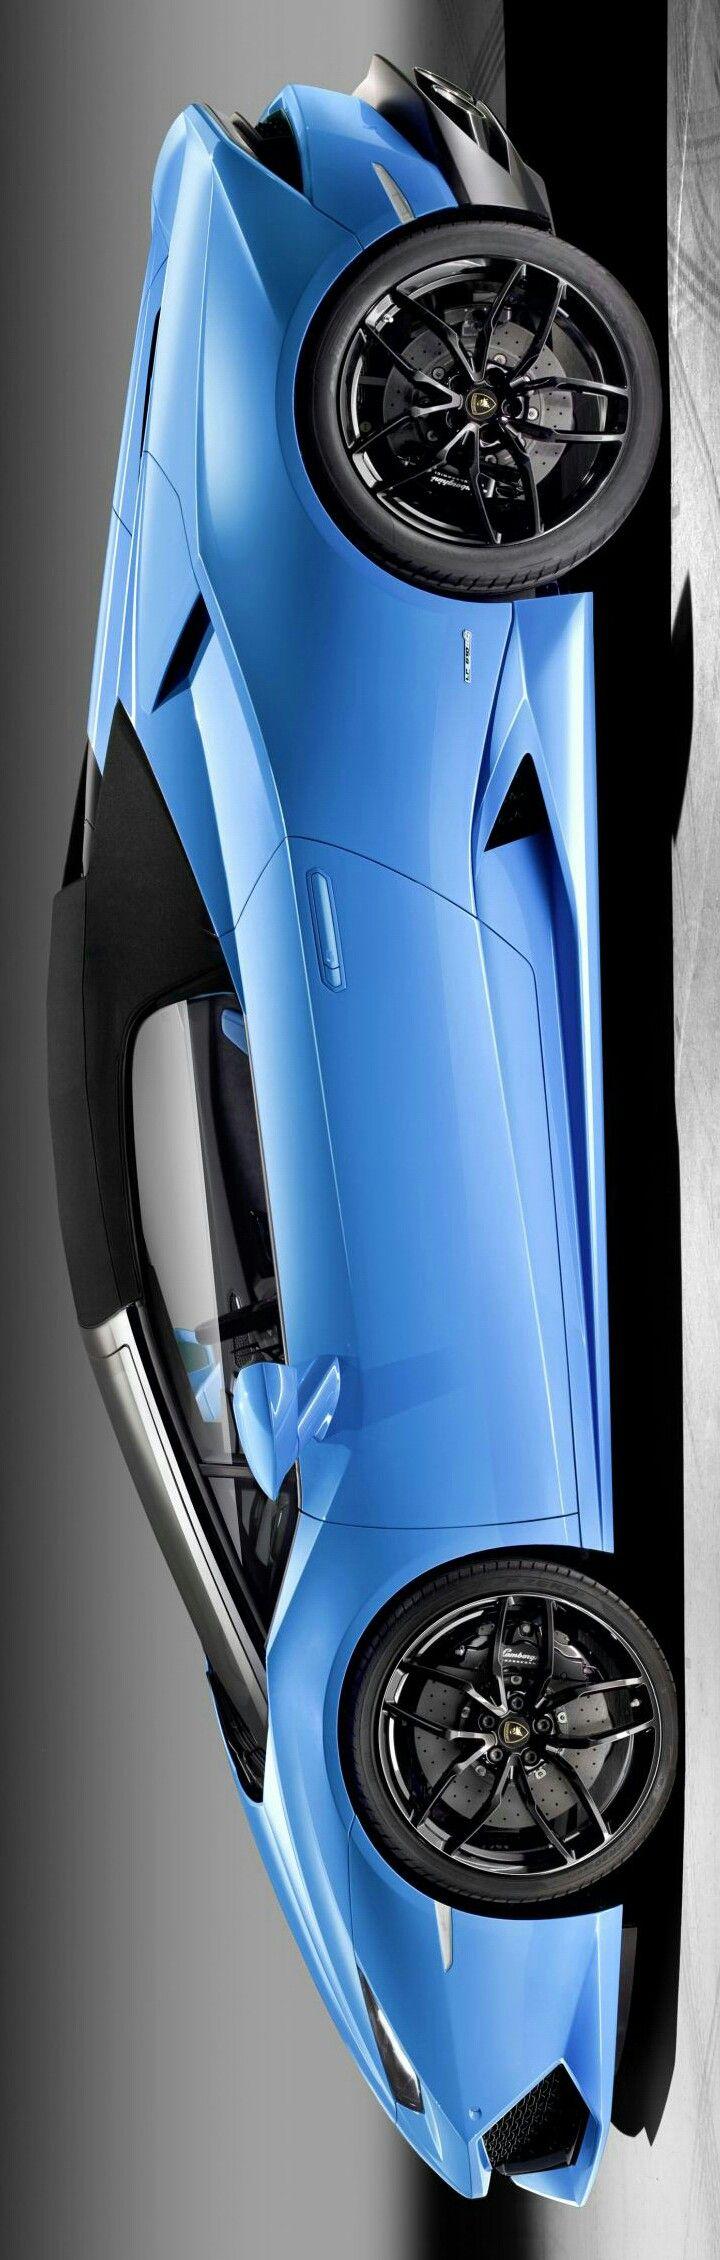 2017 Lamborghini Huracan Spyder by Levon